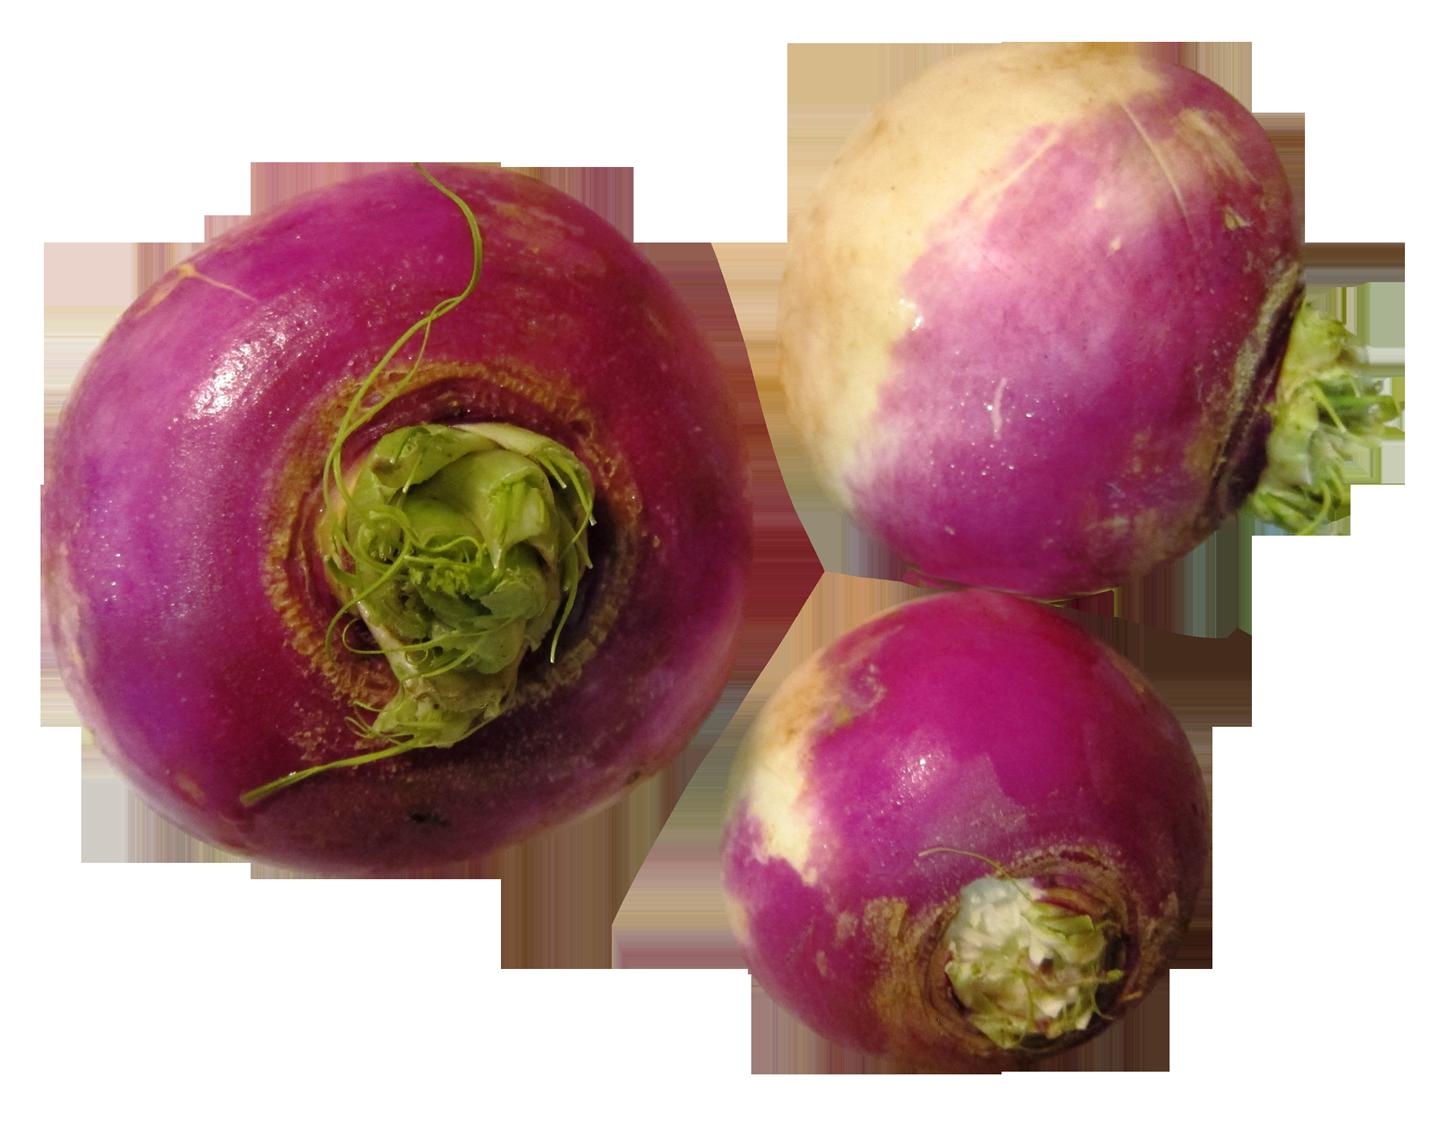 Turnip PNG Image